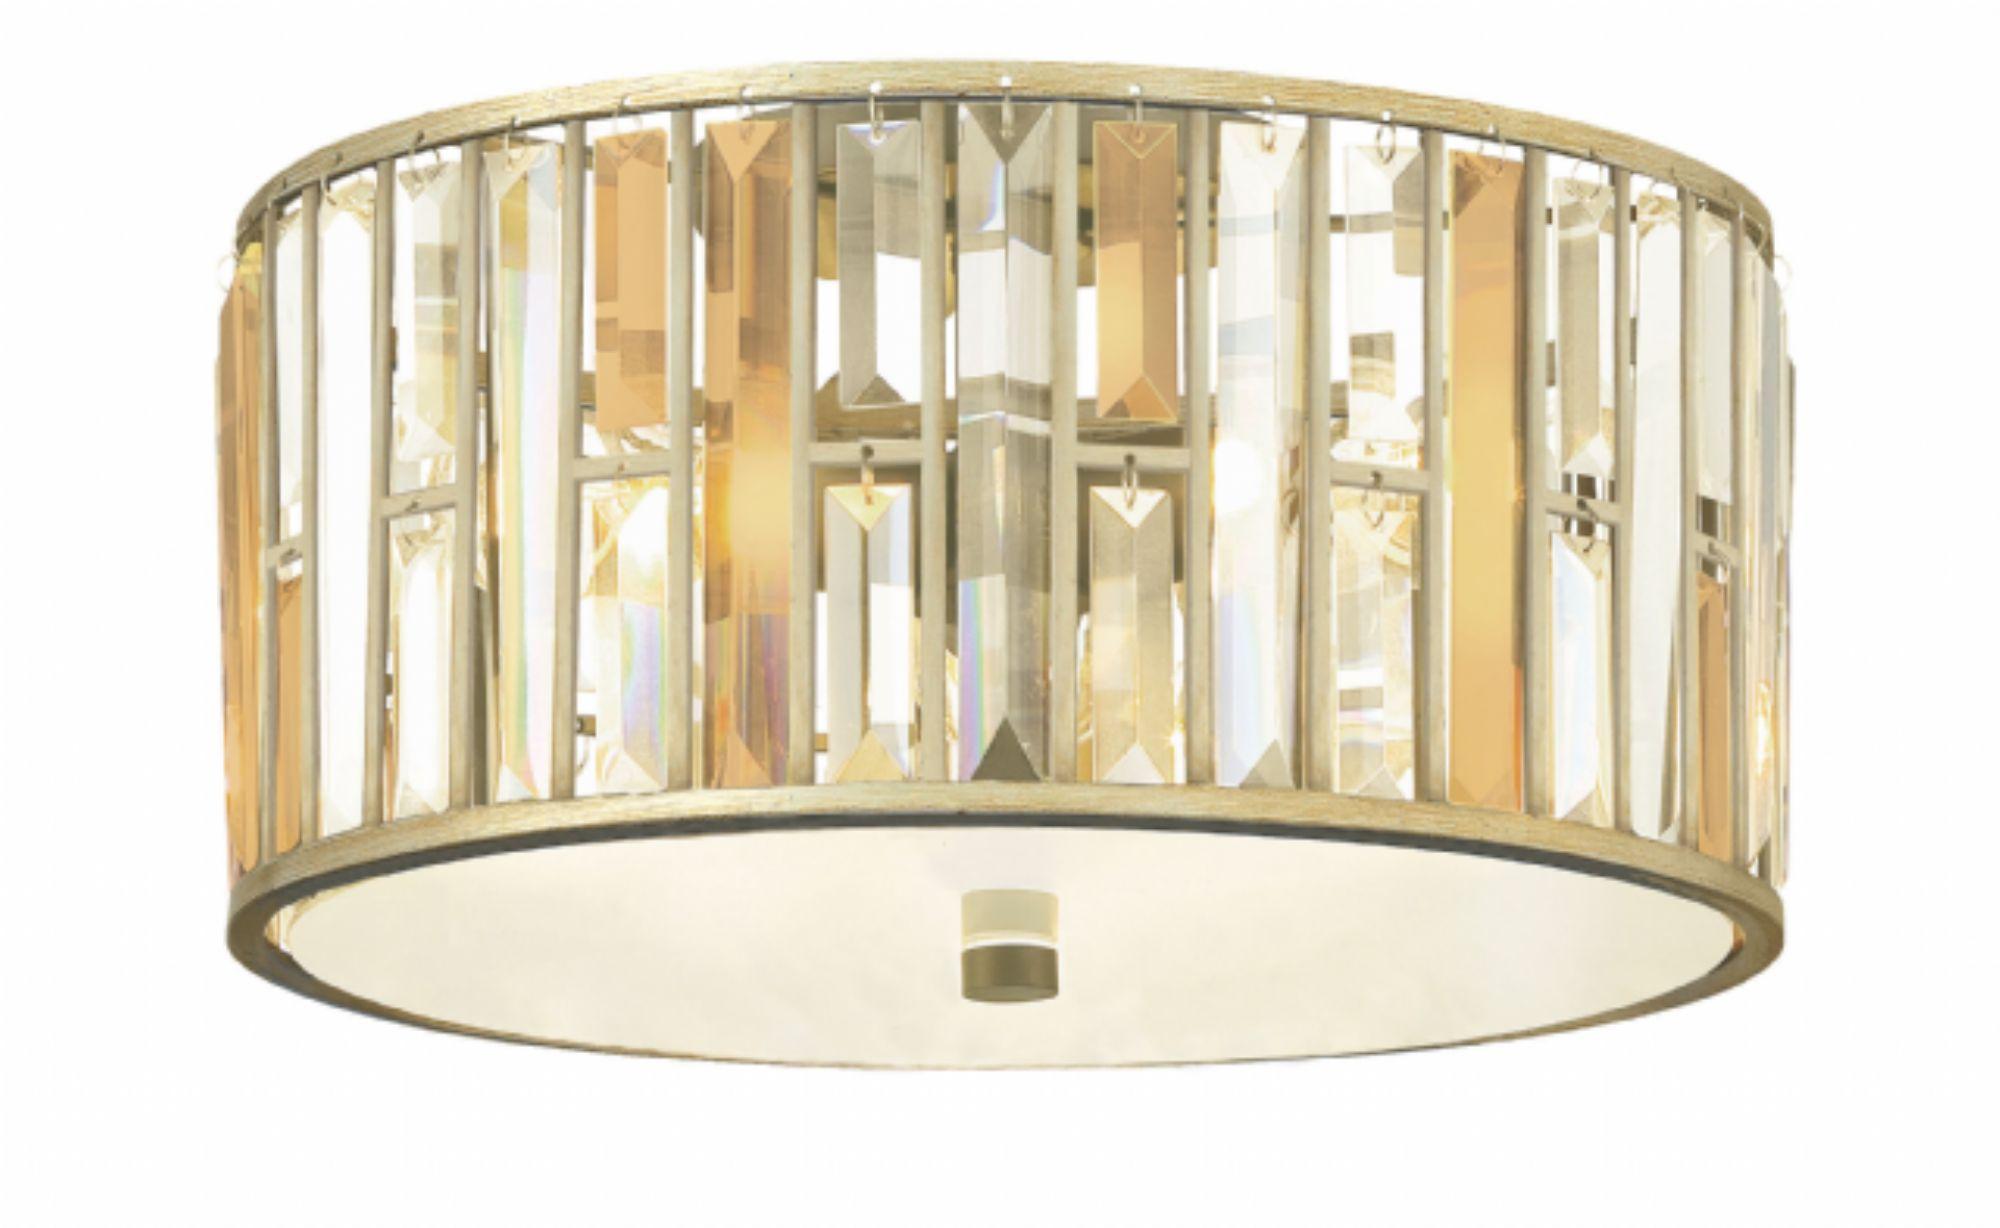 Потолочный светильник Hinkley LightingПотолочные светильники<br>&amp;lt;div&amp;gt;Материалы: металл, хрусталь&amp;lt;br&amp;gt;Цвет: сусальное серебро&amp;lt;div&amp;gt;Вид цоколя: Е27&amp;lt;/div&amp;gt;&amp;lt;div&amp;gt;Мощность лампы: 100W&amp;lt;/div&amp;gt;&amp;lt;div&amp;gt;Количество ламп: 3&amp;lt;/div&amp;gt;&amp;lt;div&amp;gt;Наличие ламп: нет&amp;lt;/div&amp;gt;&amp;lt;/div&amp;gt;<br><br>Material: Металл<br>Height см: 29,2<br>Diameter см: 50,8